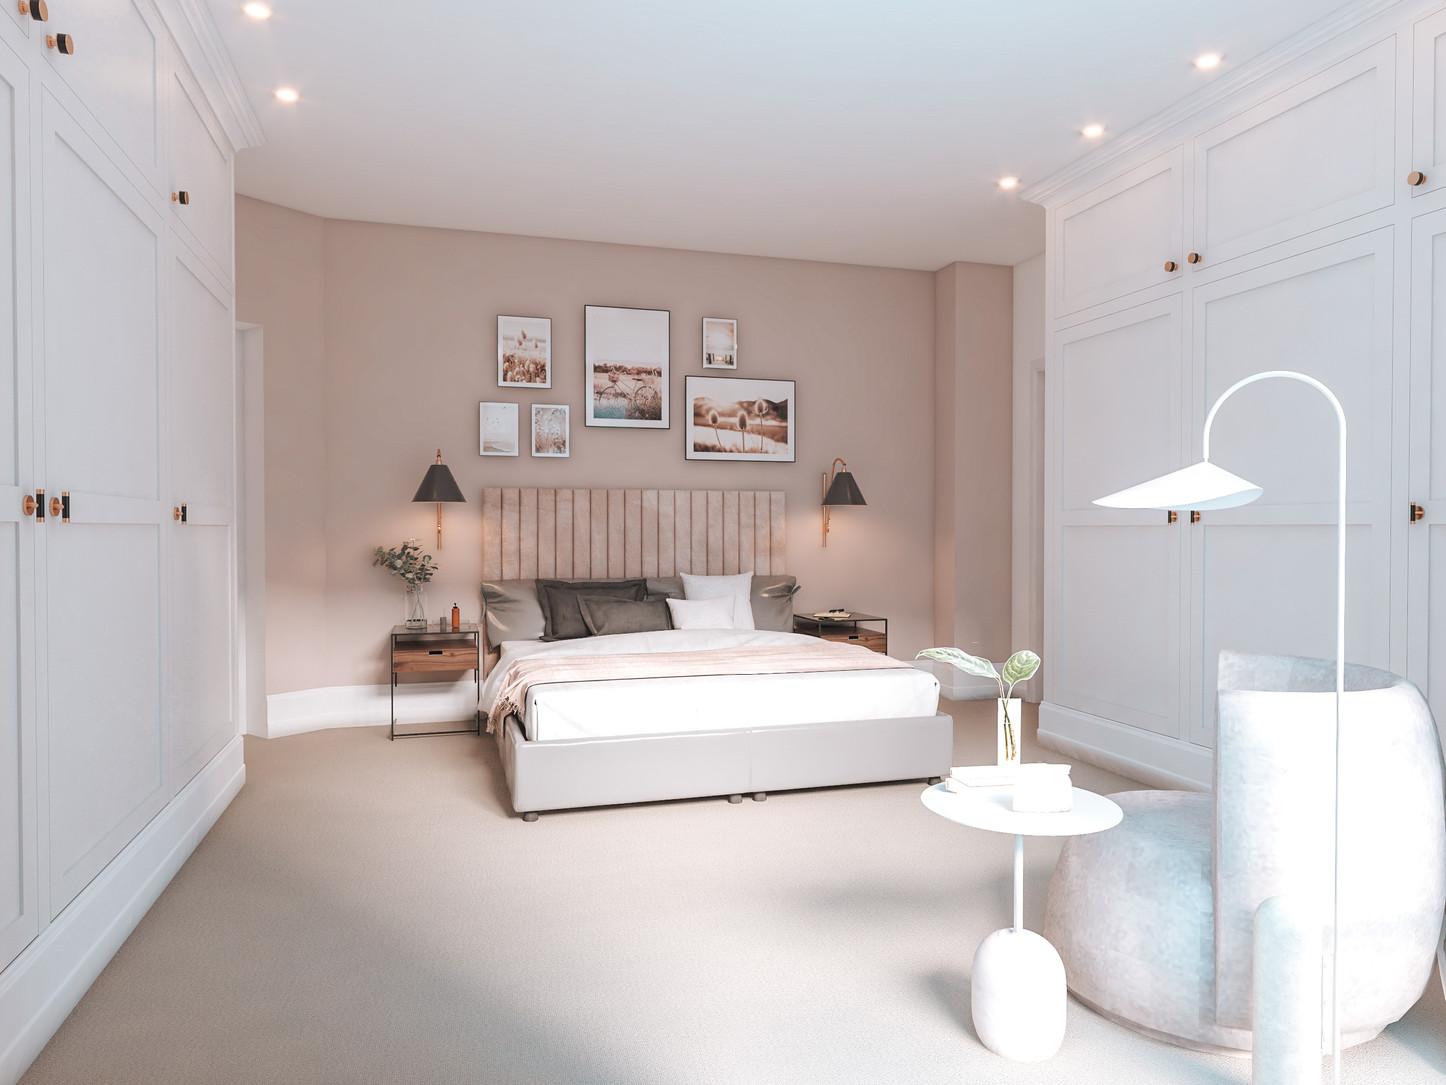 Interior_design_master_bedroom_1_contemp